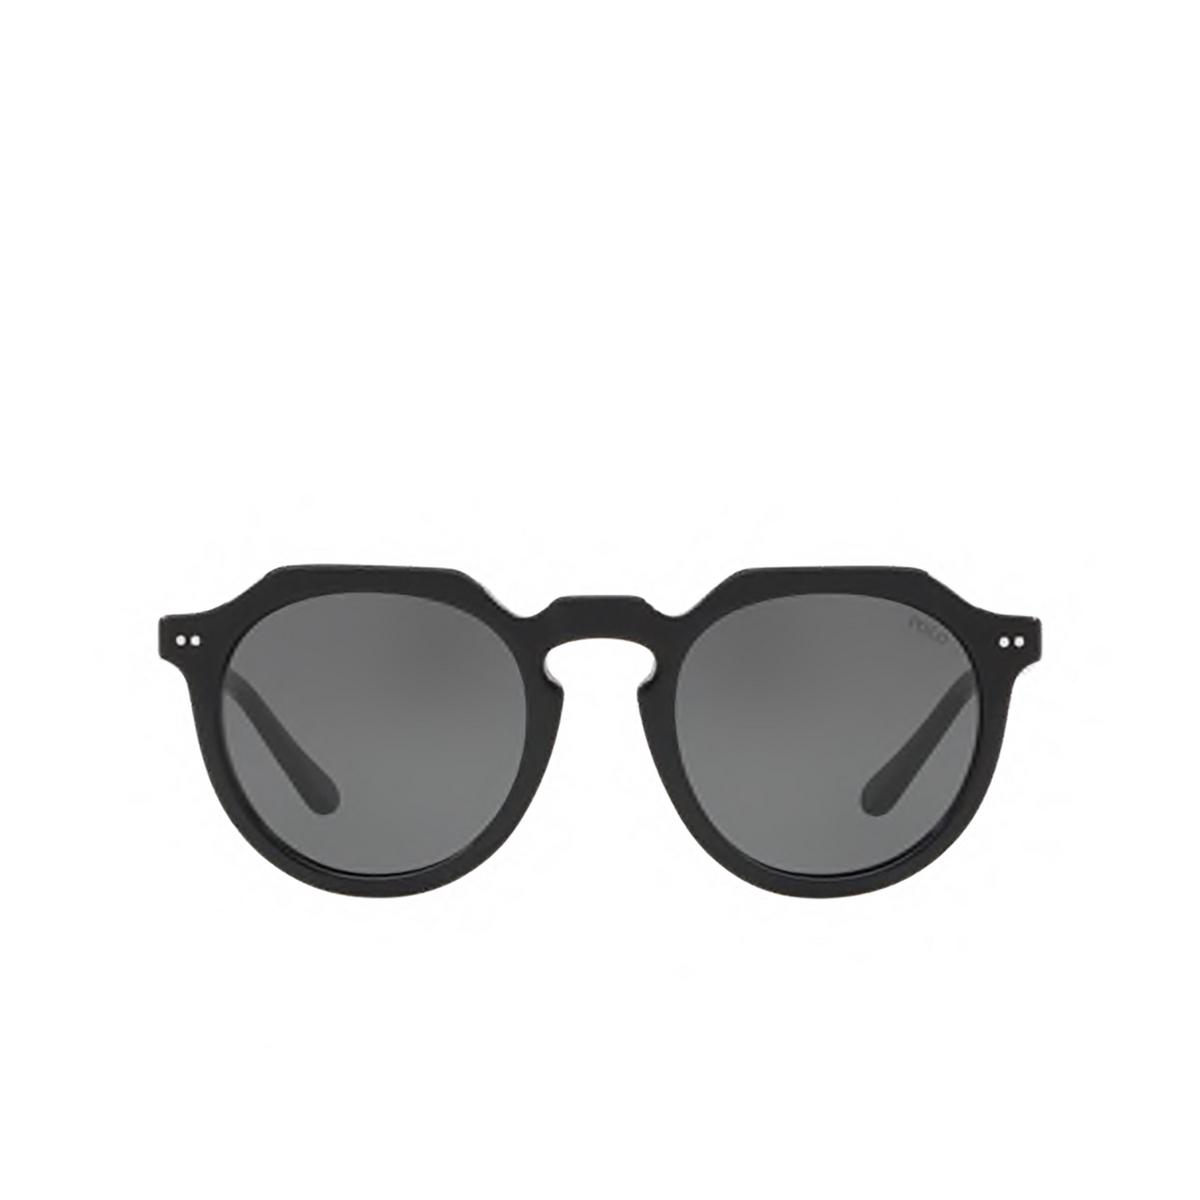 Polo Ralph Lauren® Irregular Sunglasses: PH4138 color 500187.